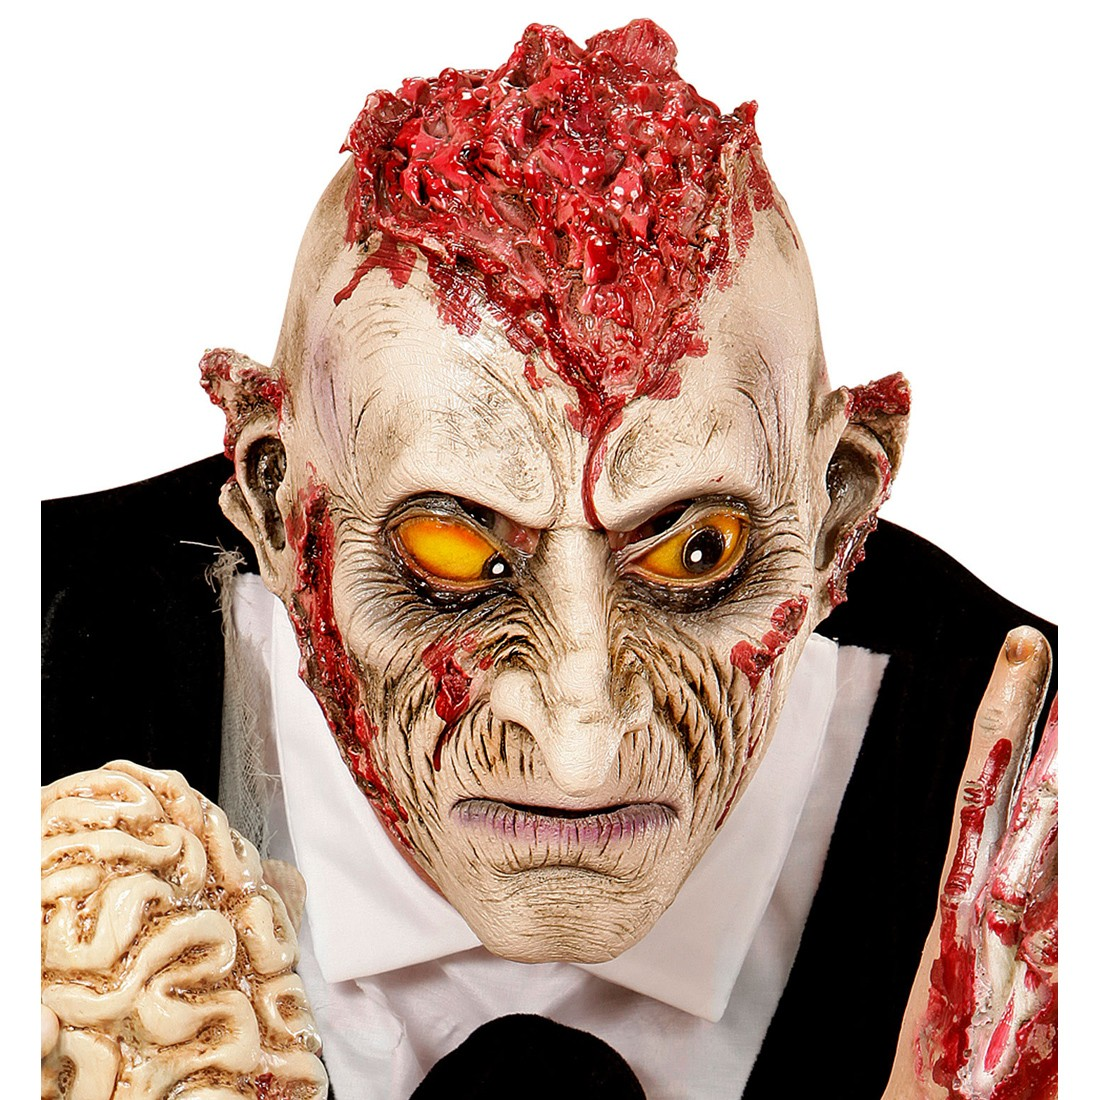 Zombie maske psycho monstermaske offenes gehirn horror zombiemaske halloween monster - Deguisement qui fait peur ...